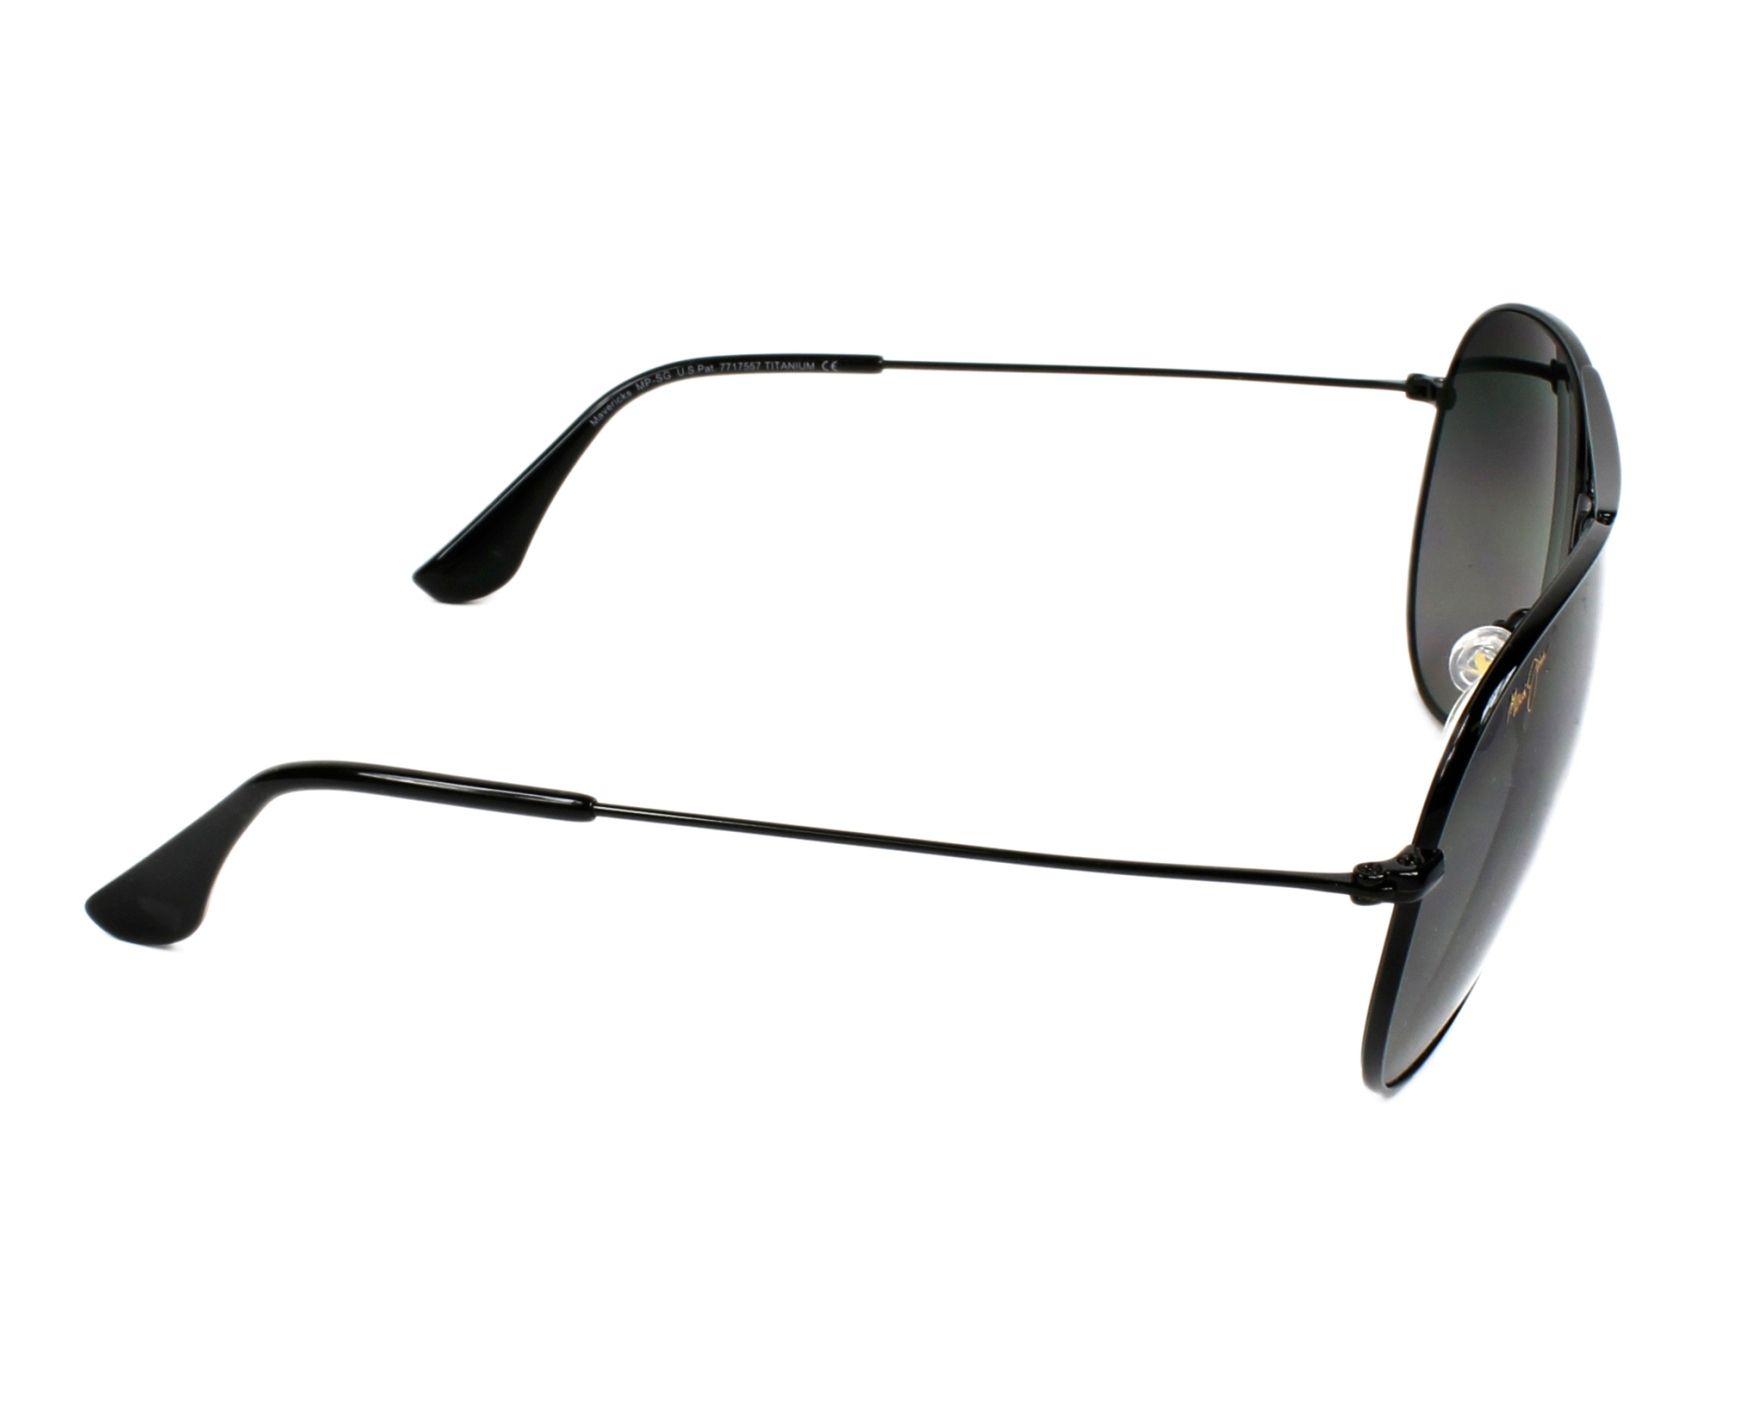 f39001a217 Sunglasses Maui Jim GS-264 02 - Black side view